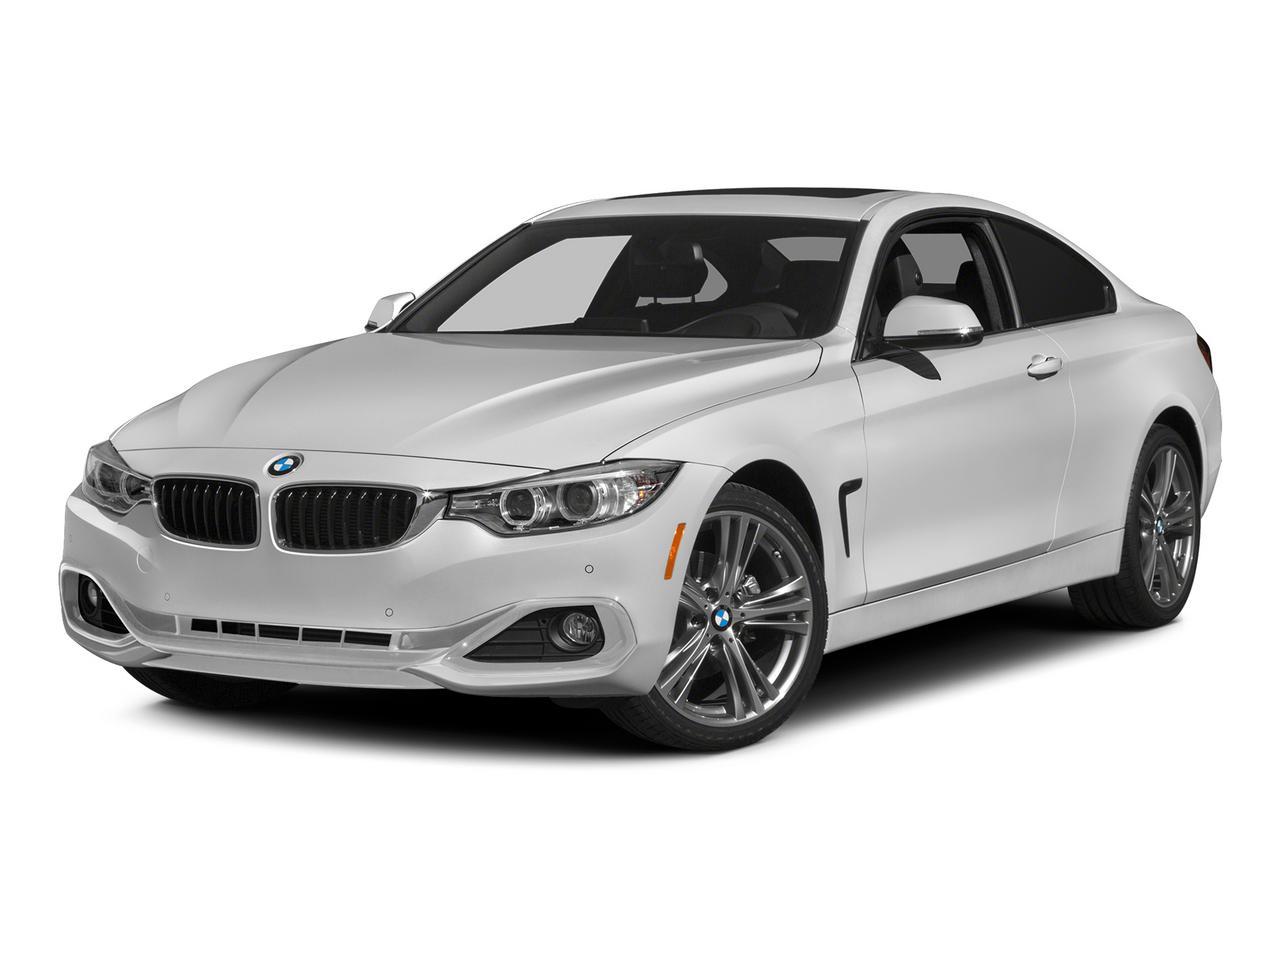 2015 BMW 428i Vehicle Photo in Pleasanton, CA 94588